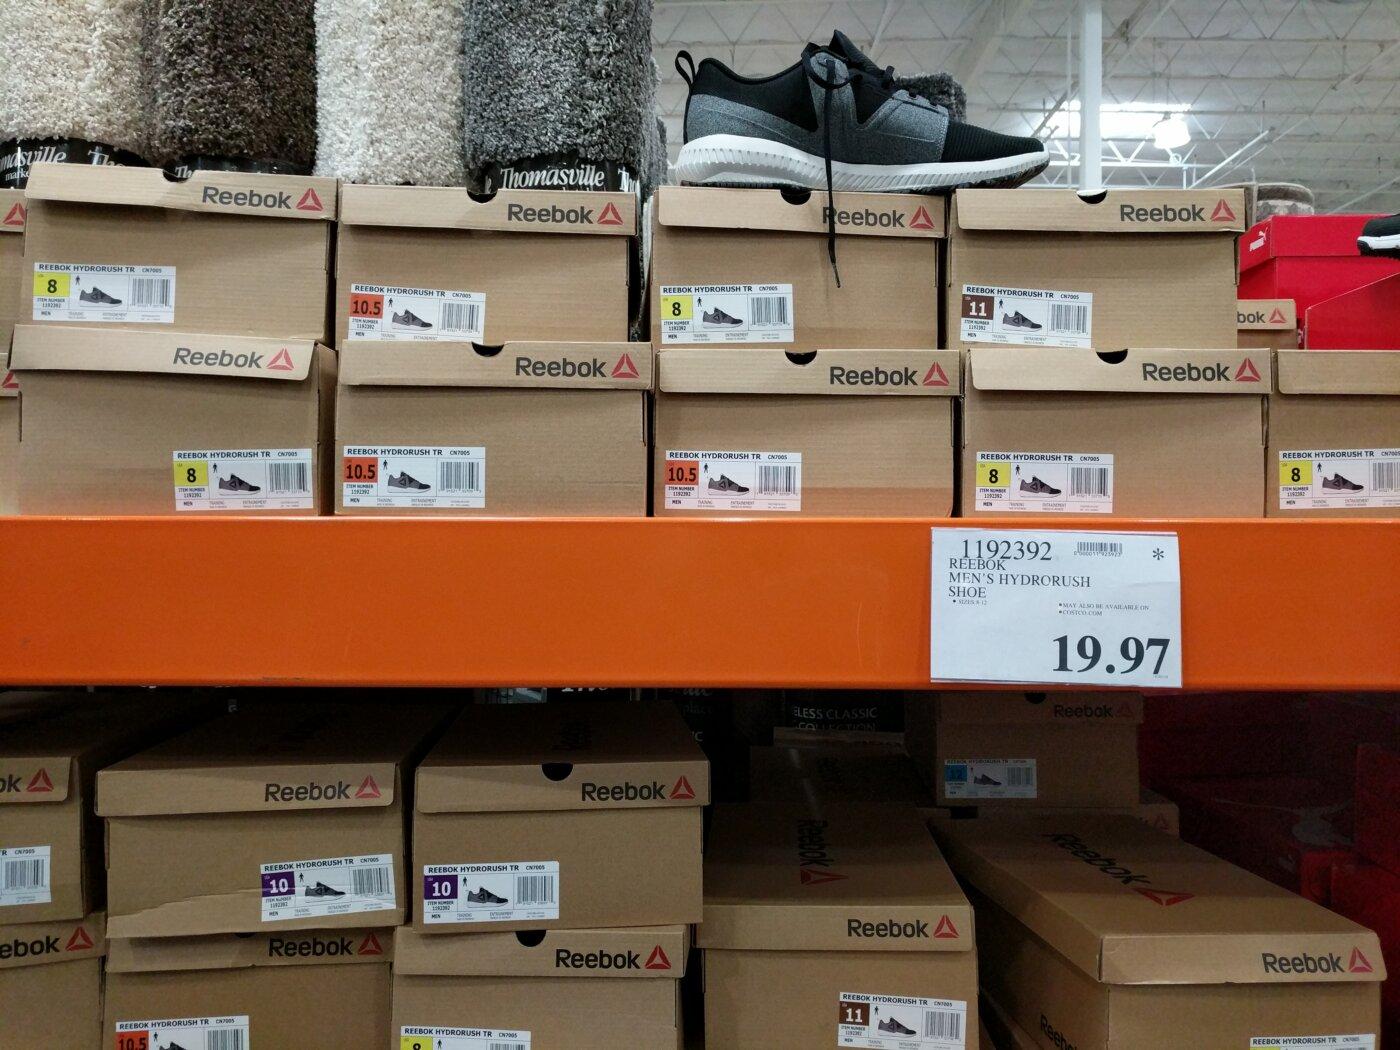 Reebok Men's Hydrorush Shoe | Costco97.com